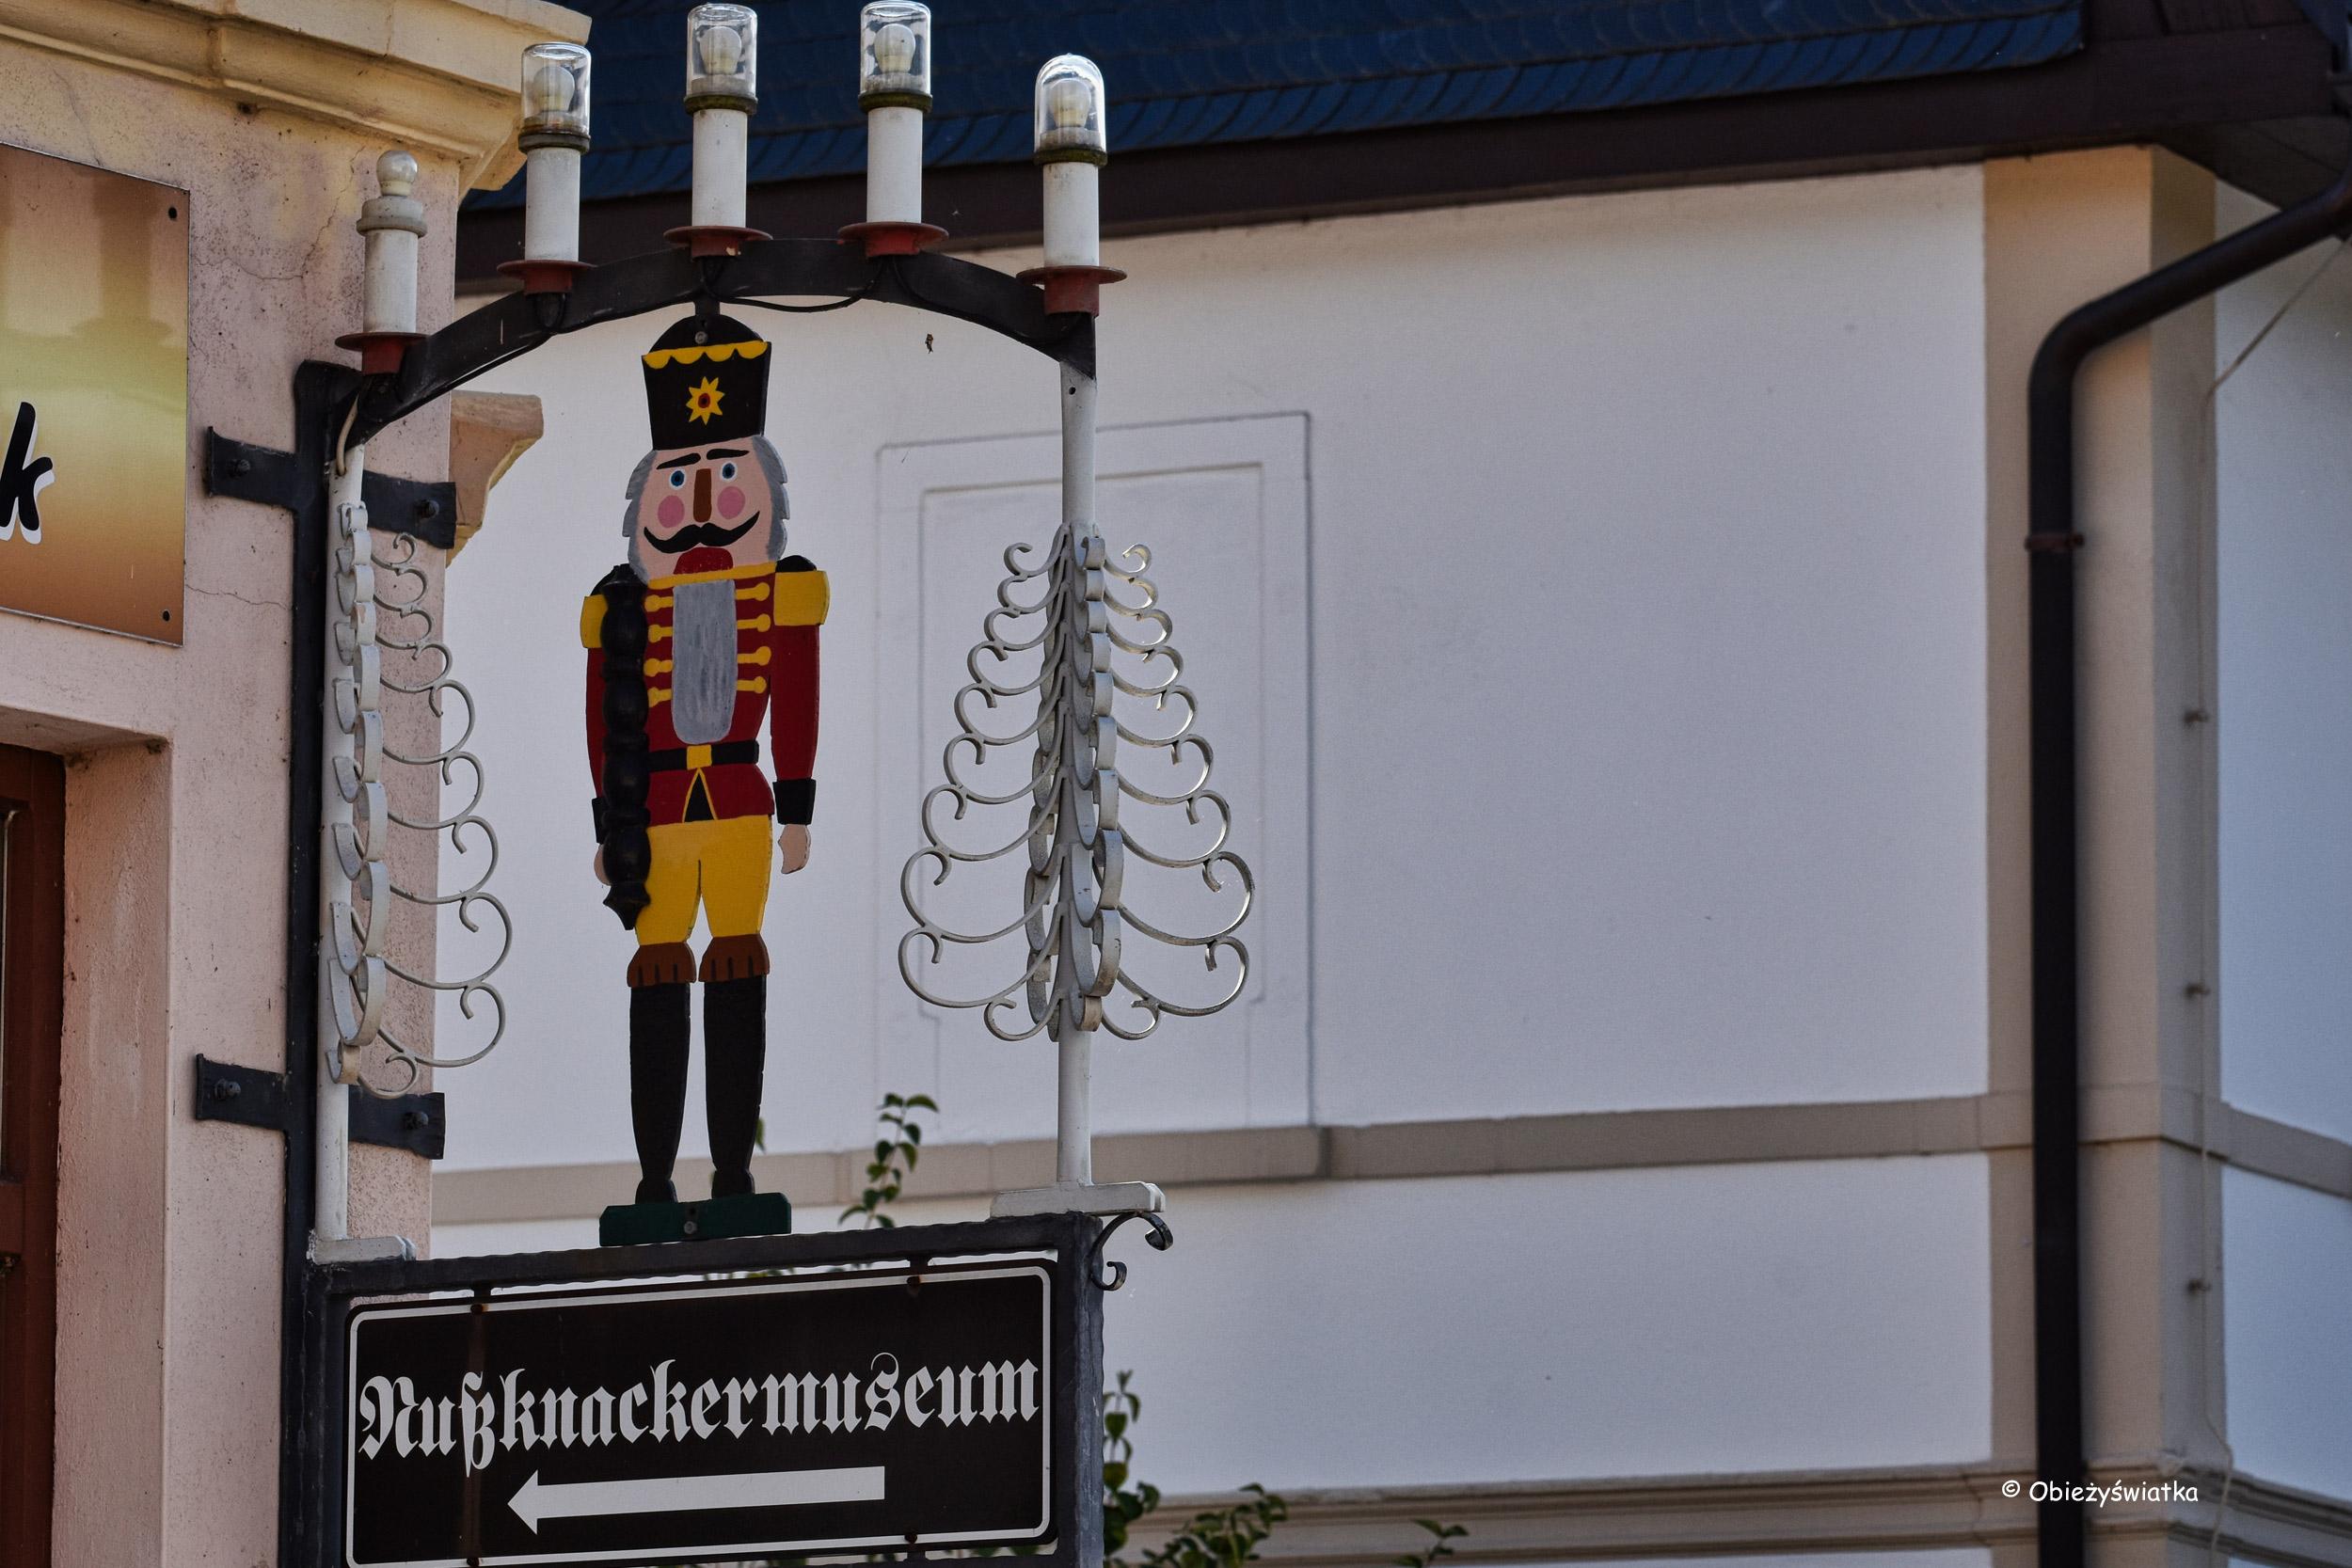 Muzeum Dziadka do orzechów, Neuhausen